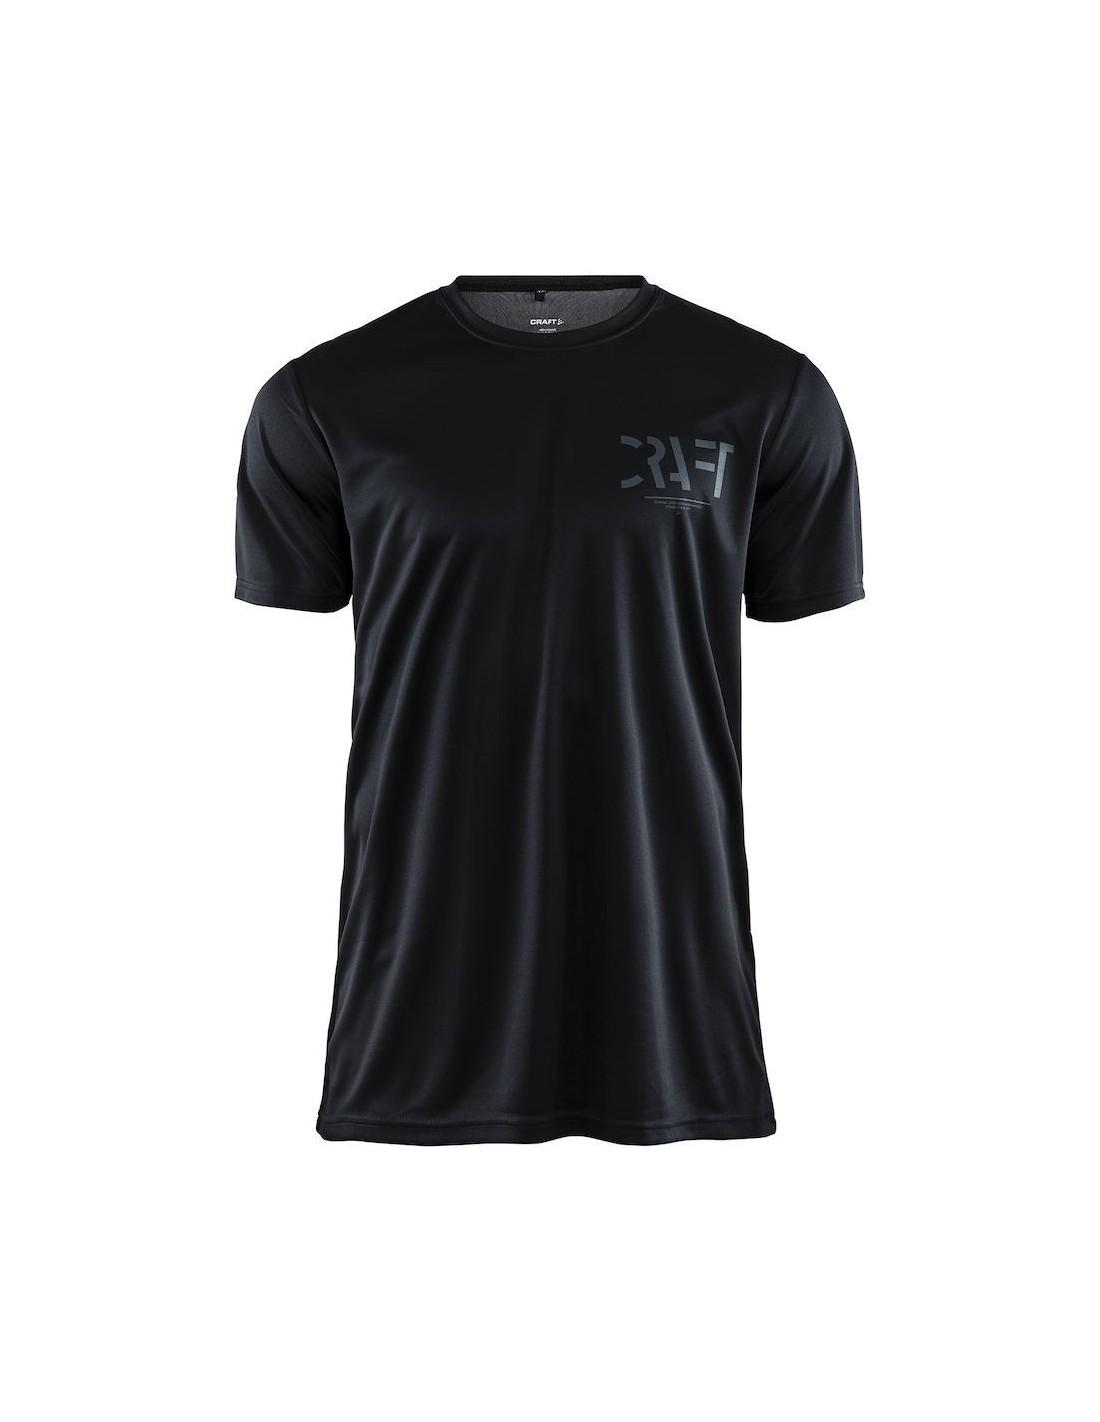 6f9e6da6a Koszulka męska sportowa Craft Eaze SS Graphic Tee czarna - STSklep